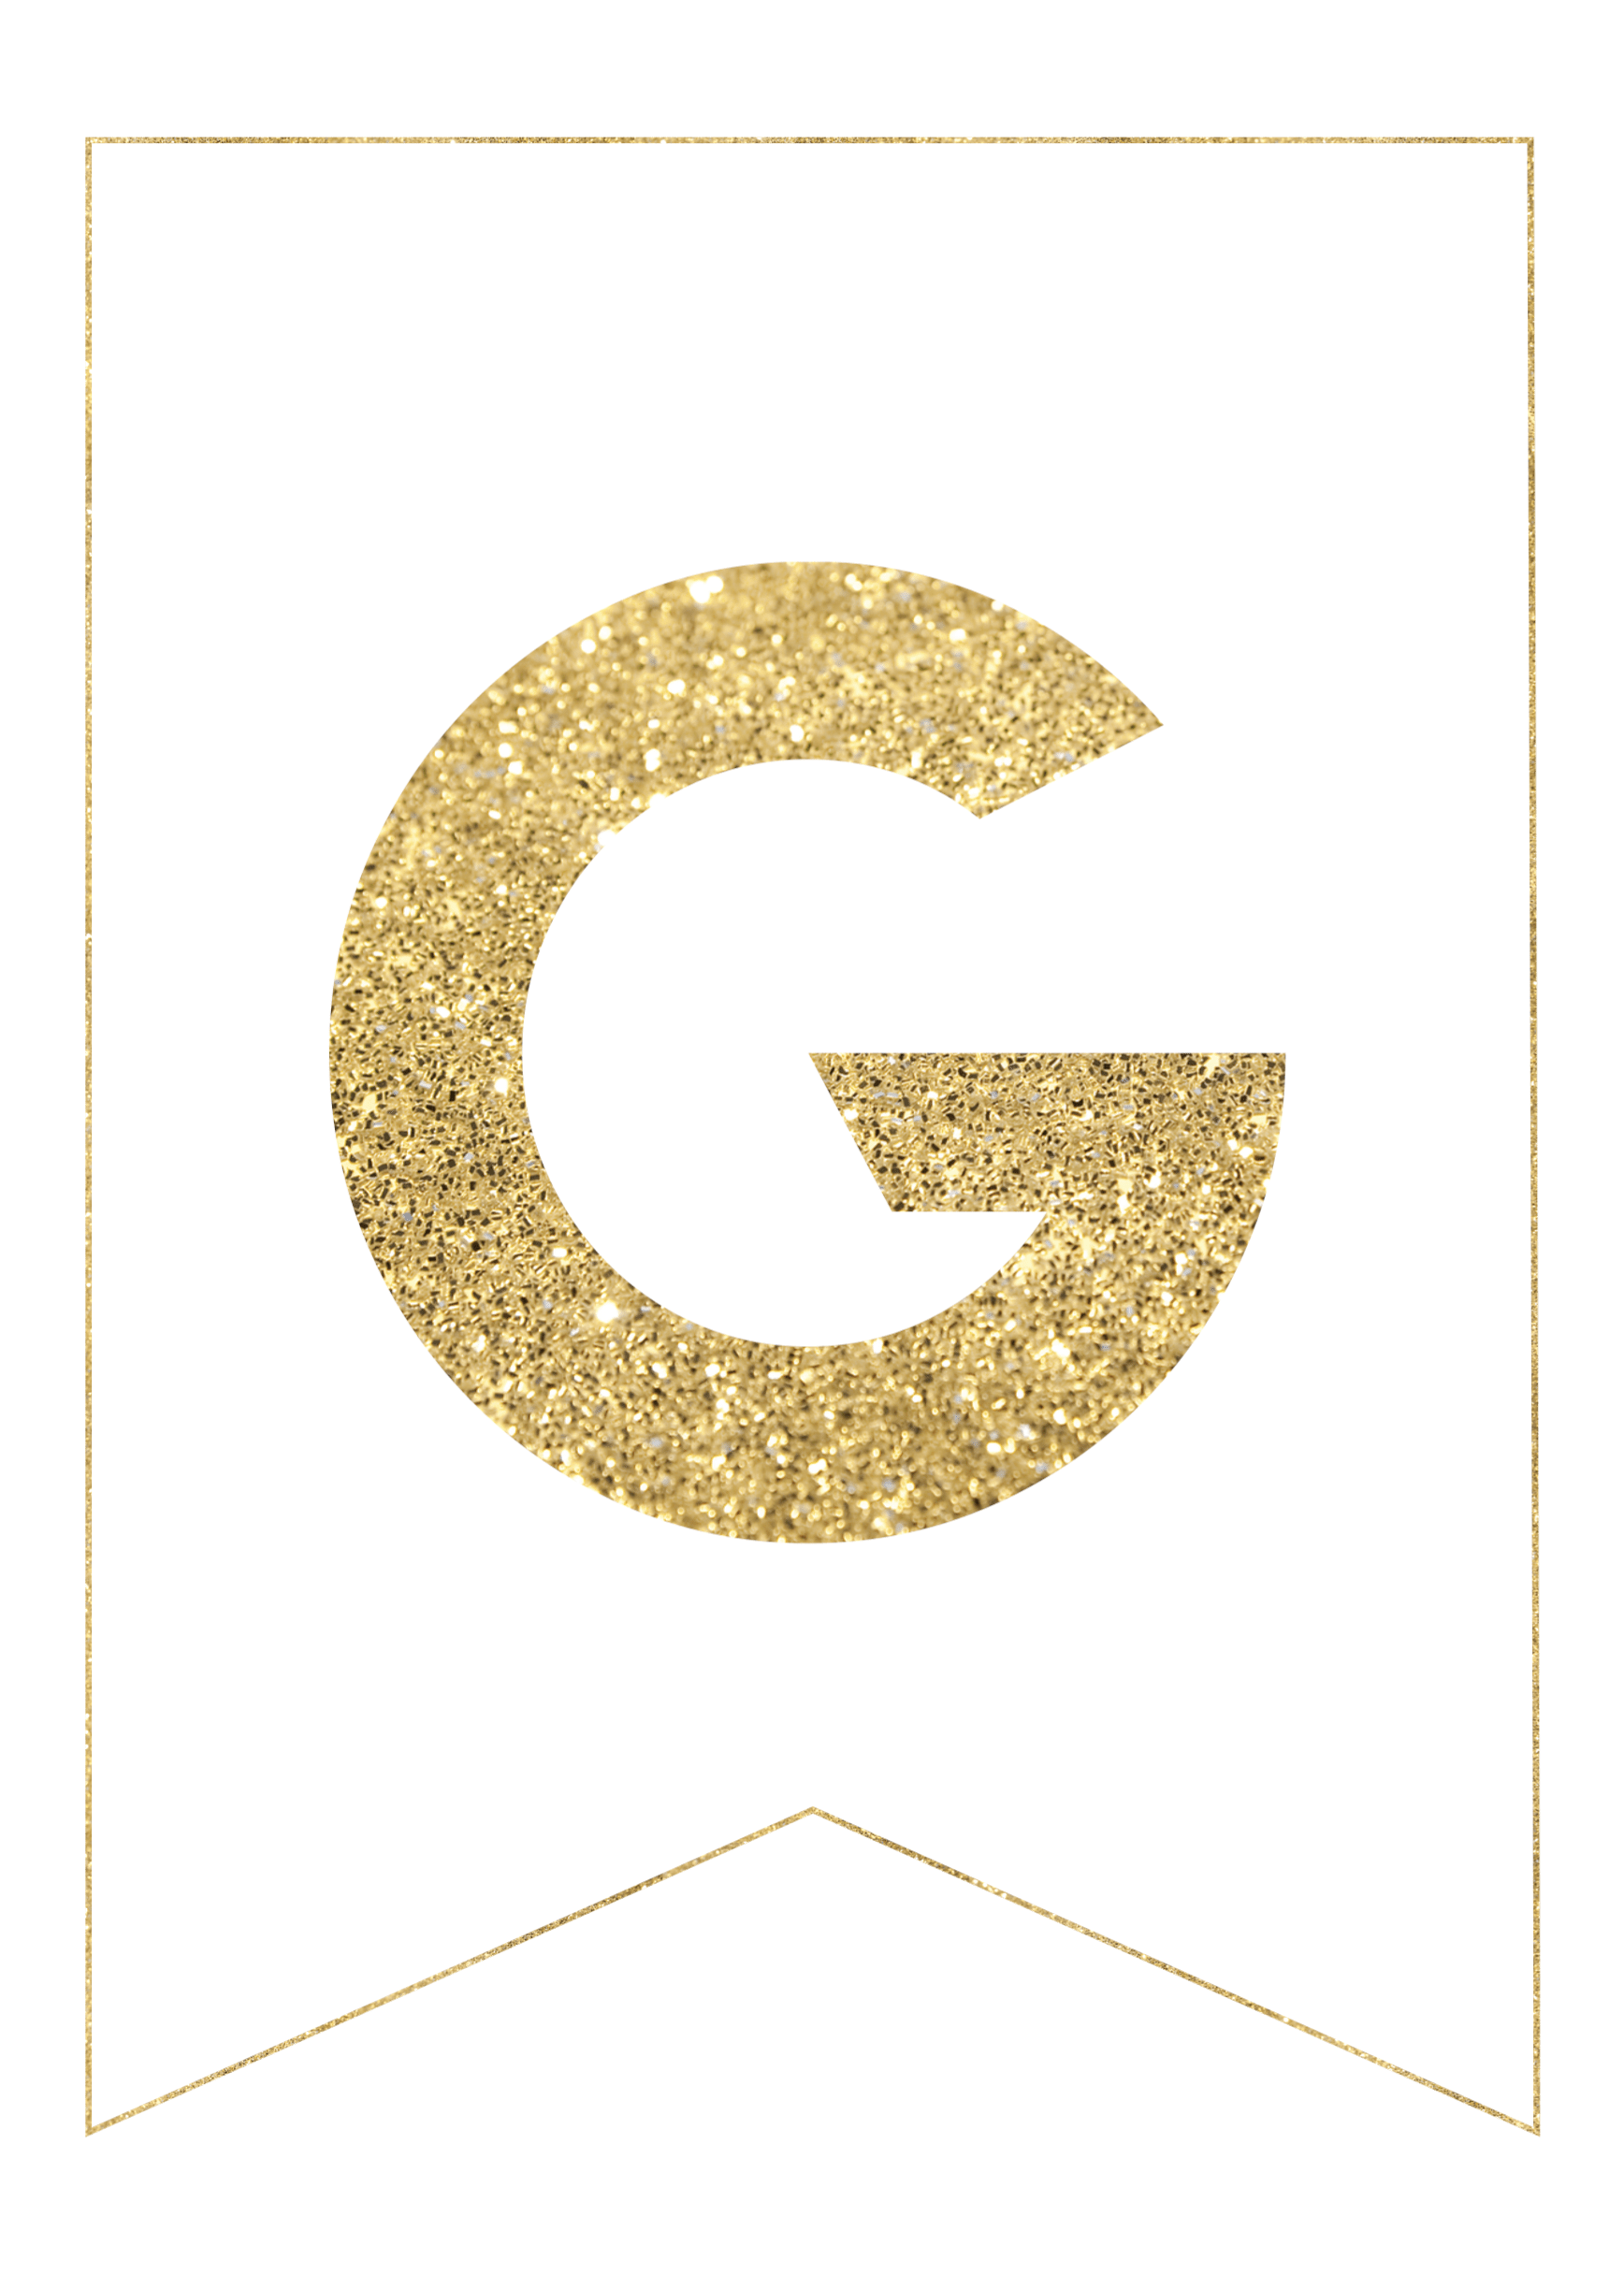 Letter G Worksheet For Preschoolers Graduation Letter